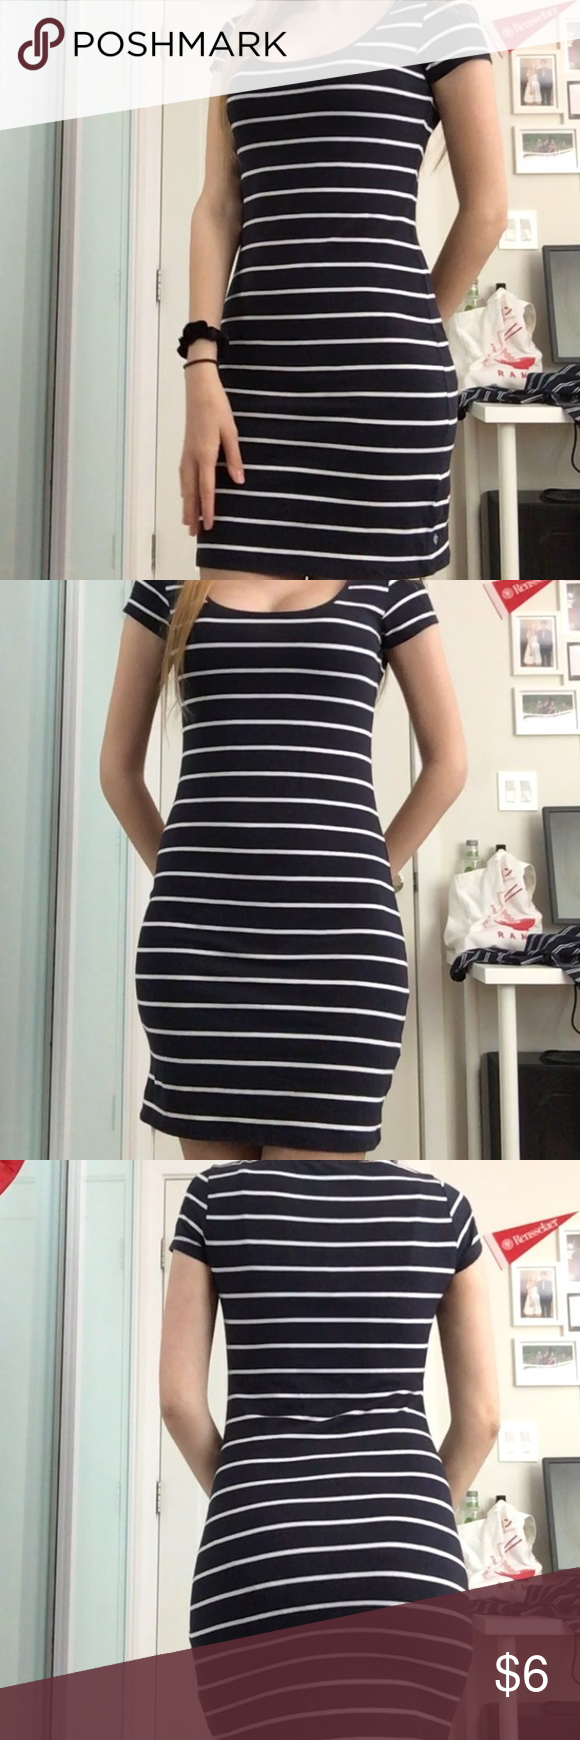 H M Navy And White Stripe Bodycon Dress Striped Bodycon Dress Bodycon Dress Dresses [ 1740 x 580 Pixel ]